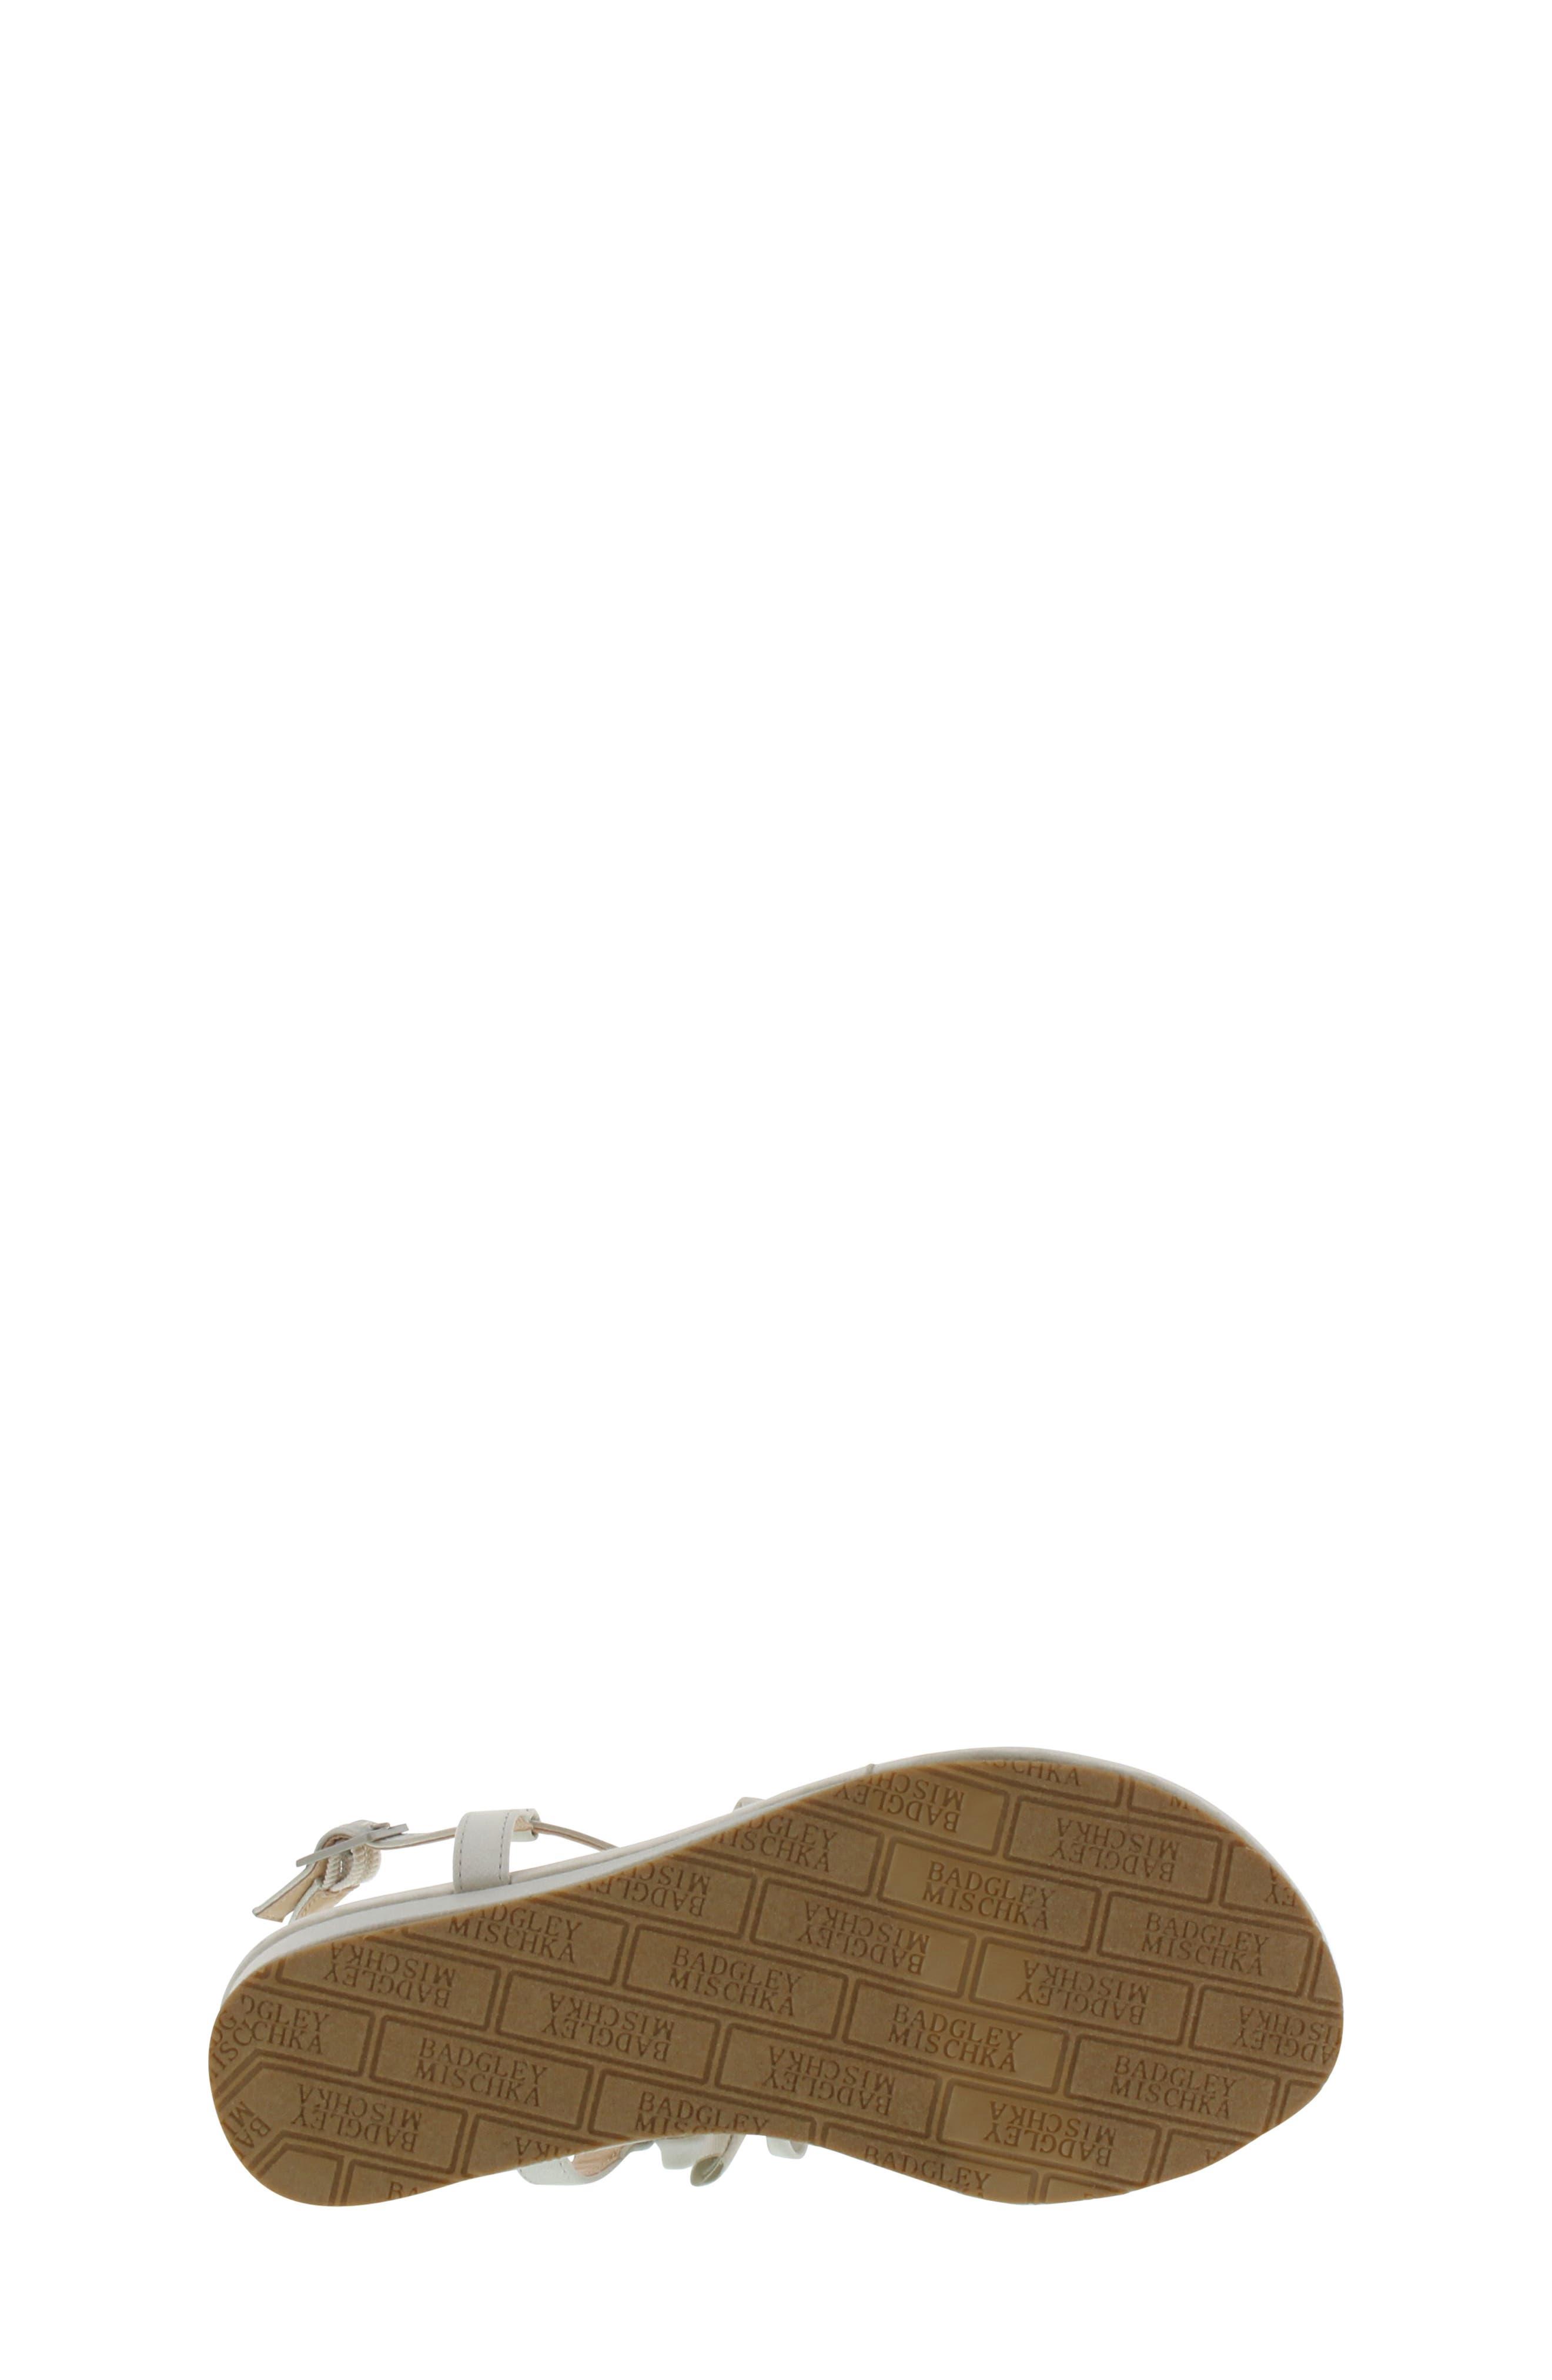 Talia Embellished Bow Sandal,                             Alternate thumbnail 6, color,                             040